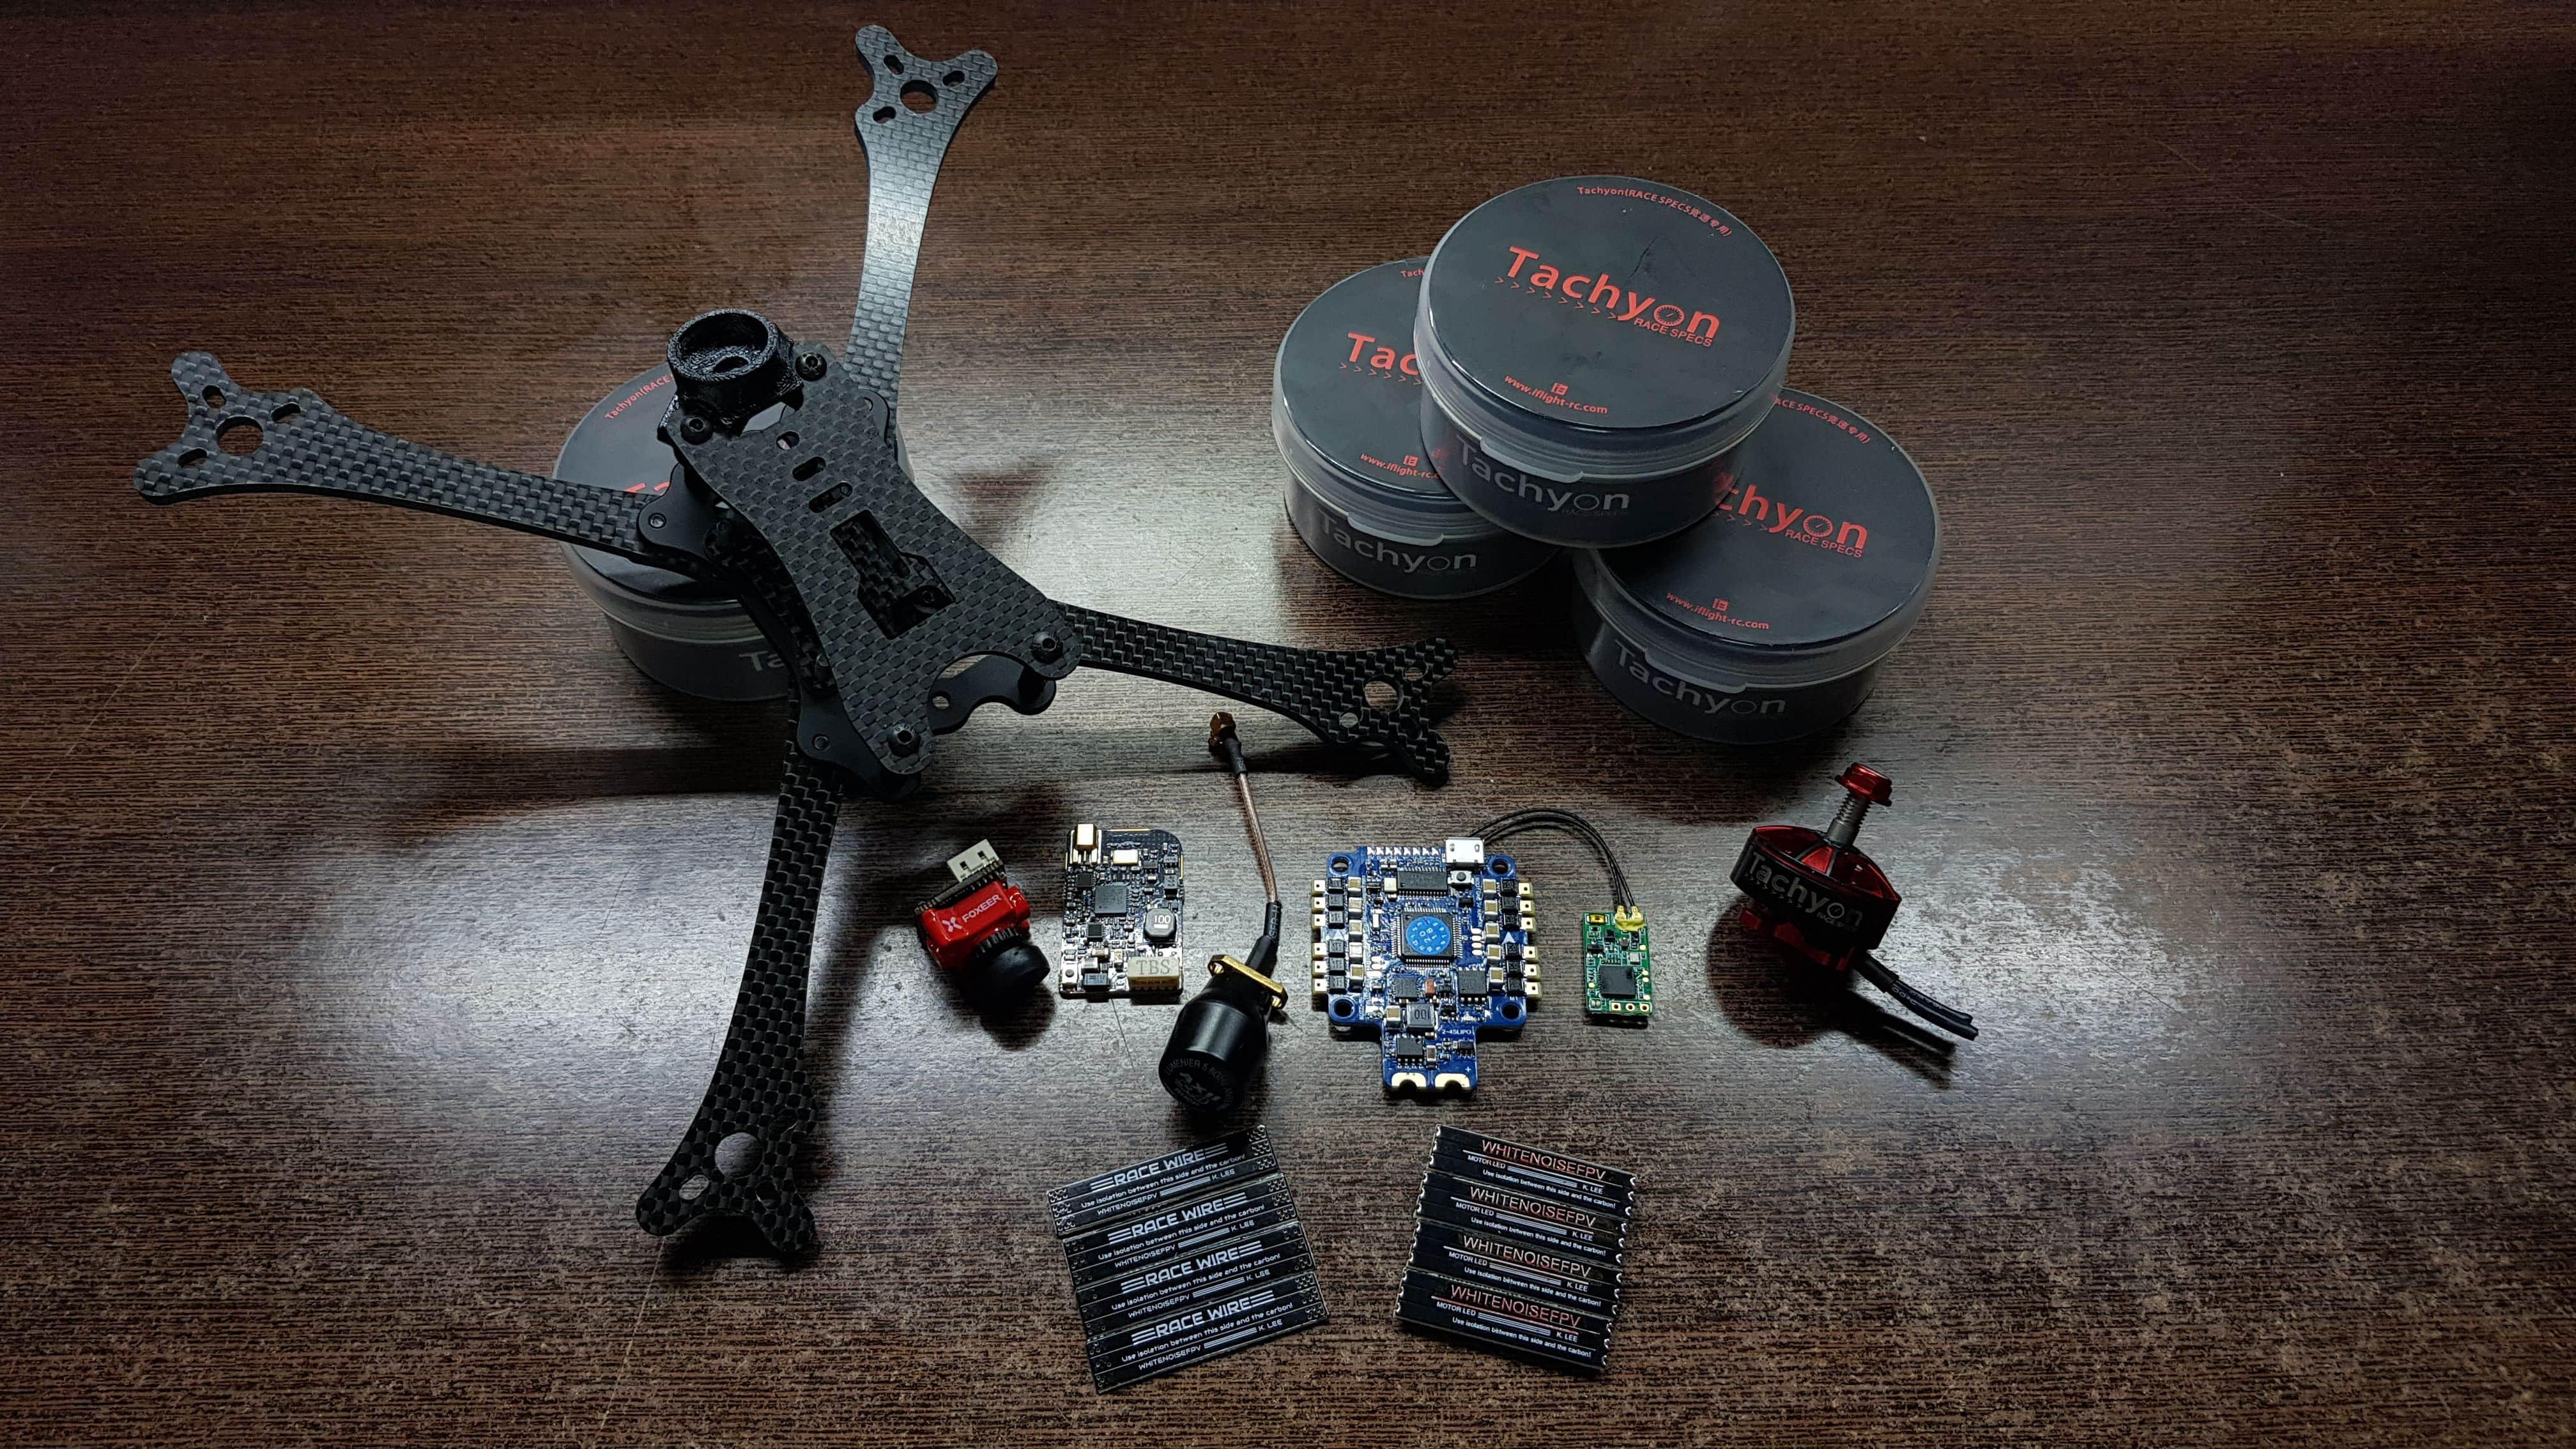 Total Rotor | f_8055_Ocx5tArZ27O6CO677ApDRuzey - Total Rotor